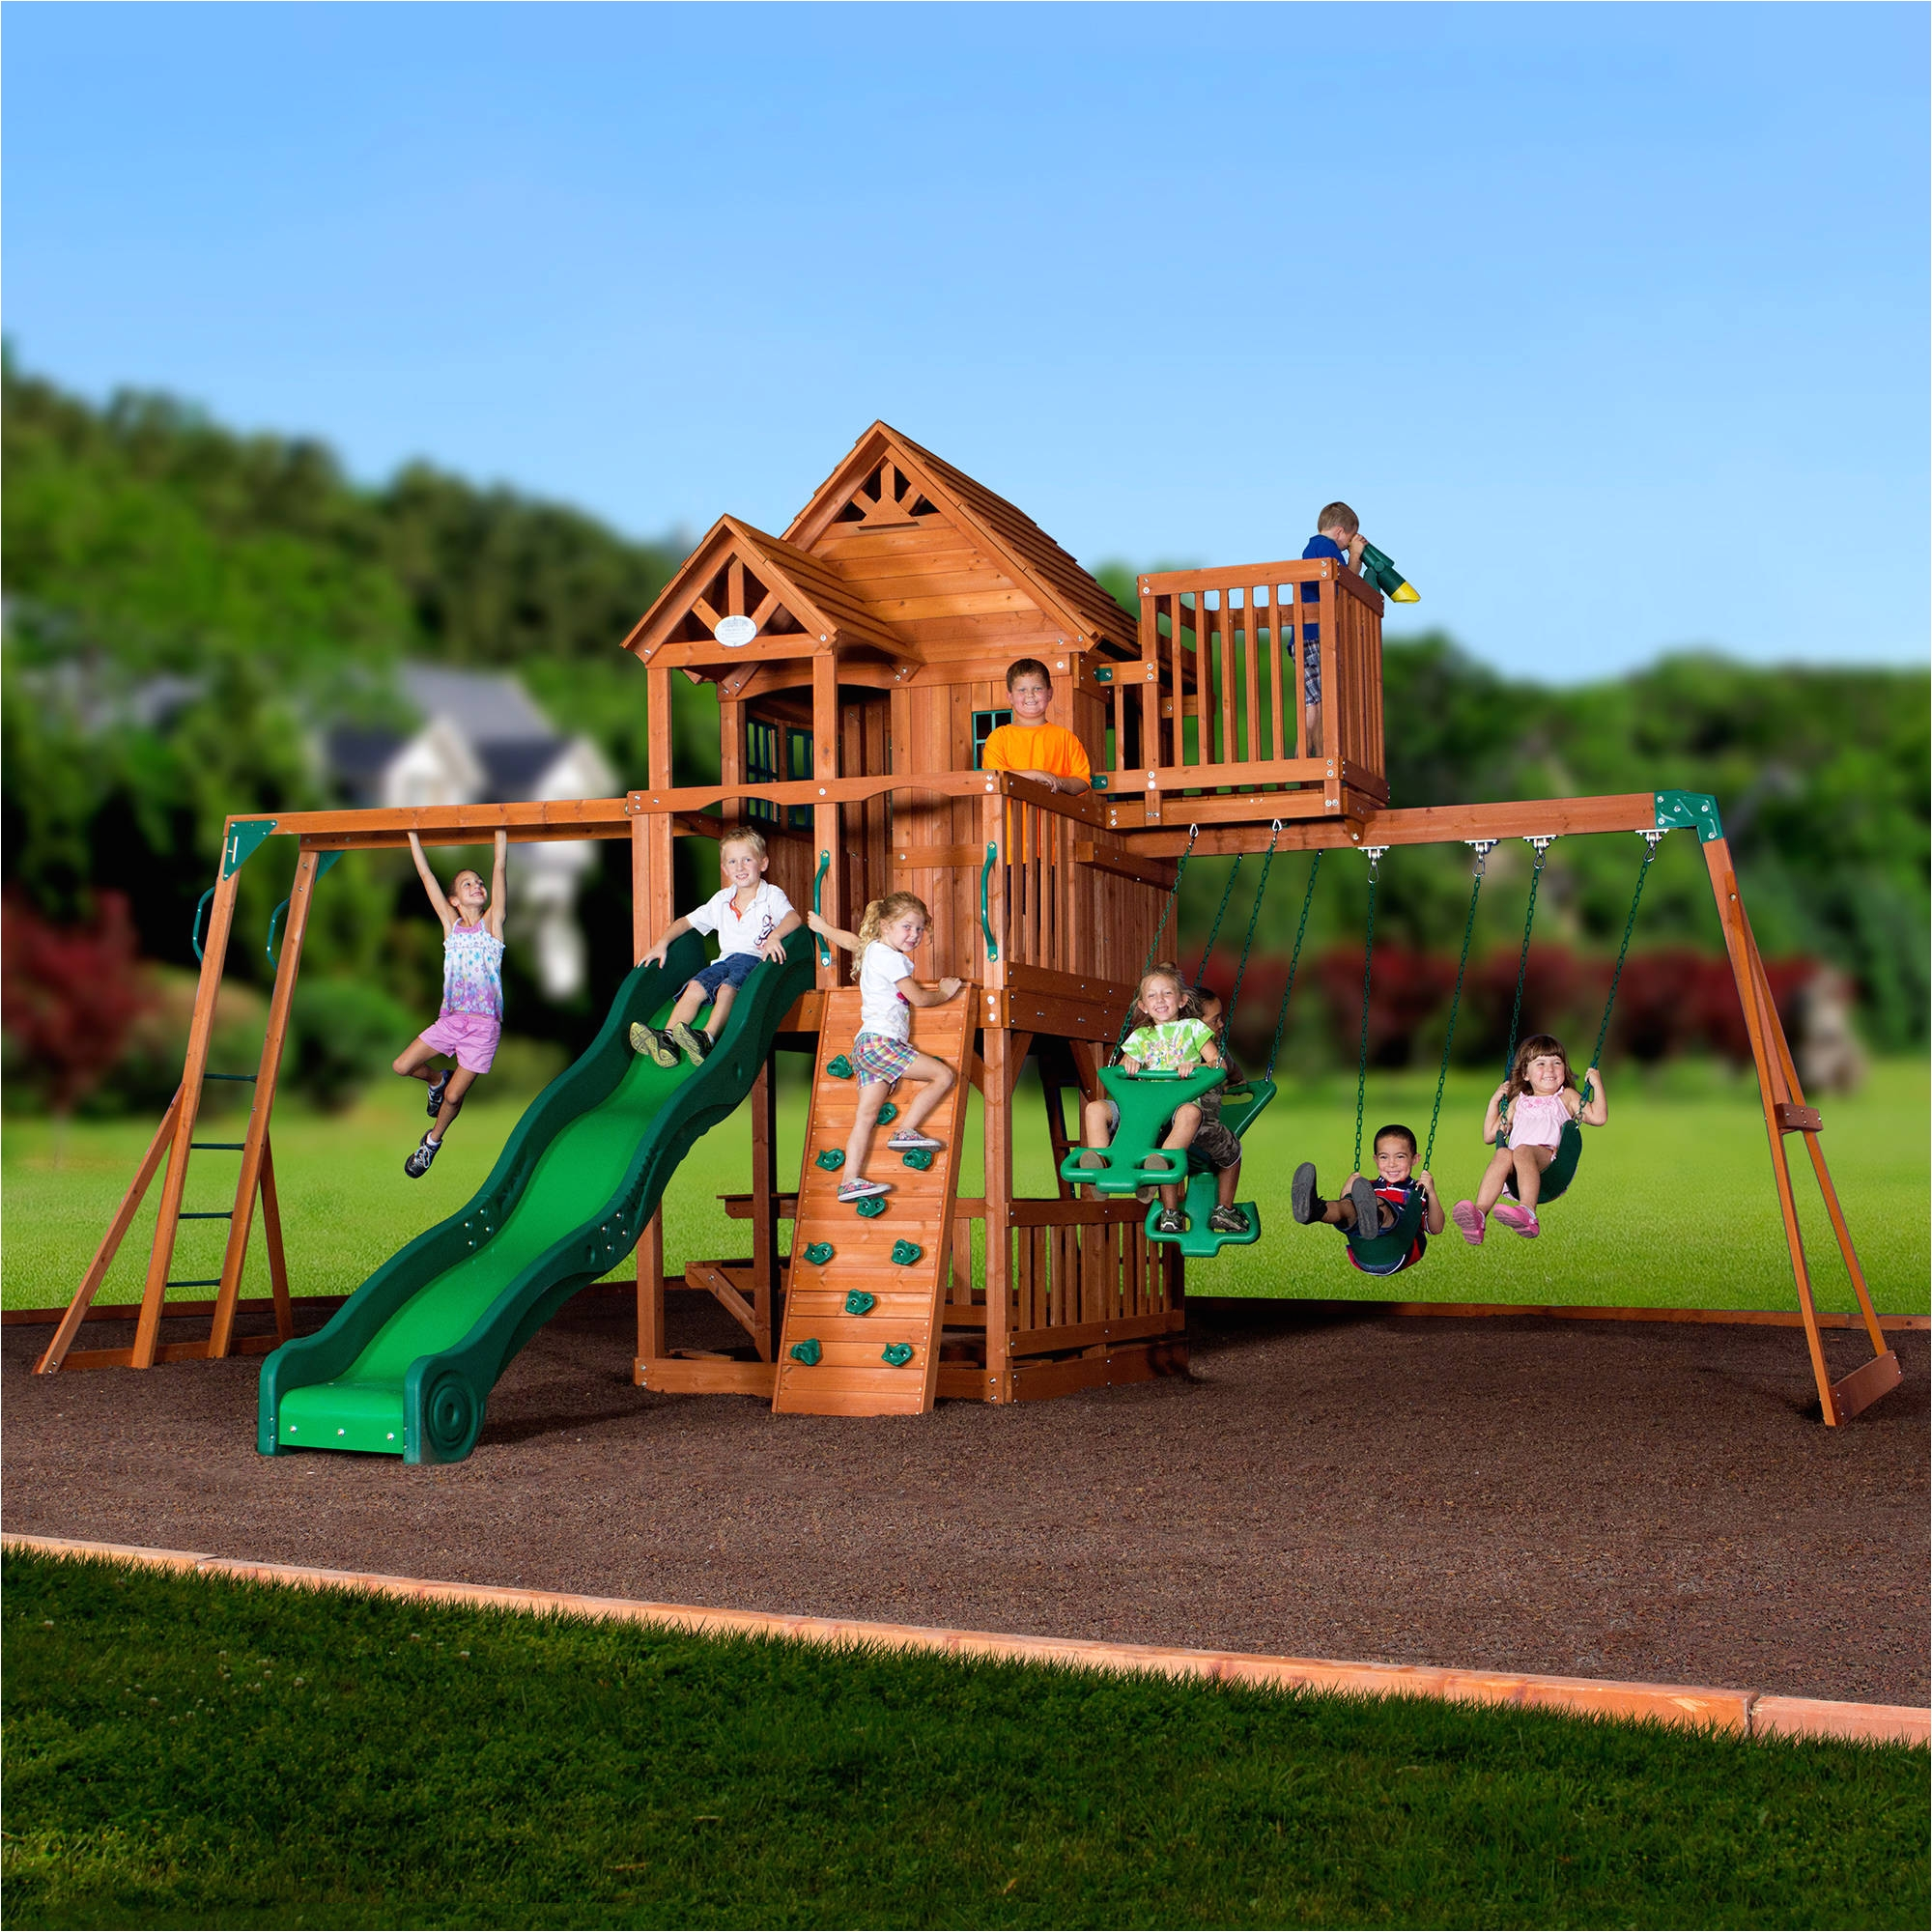 Backyard Swing Sets Walmart Backyard Swing Sets Walmart Backyard Playsets with Monkey Bars